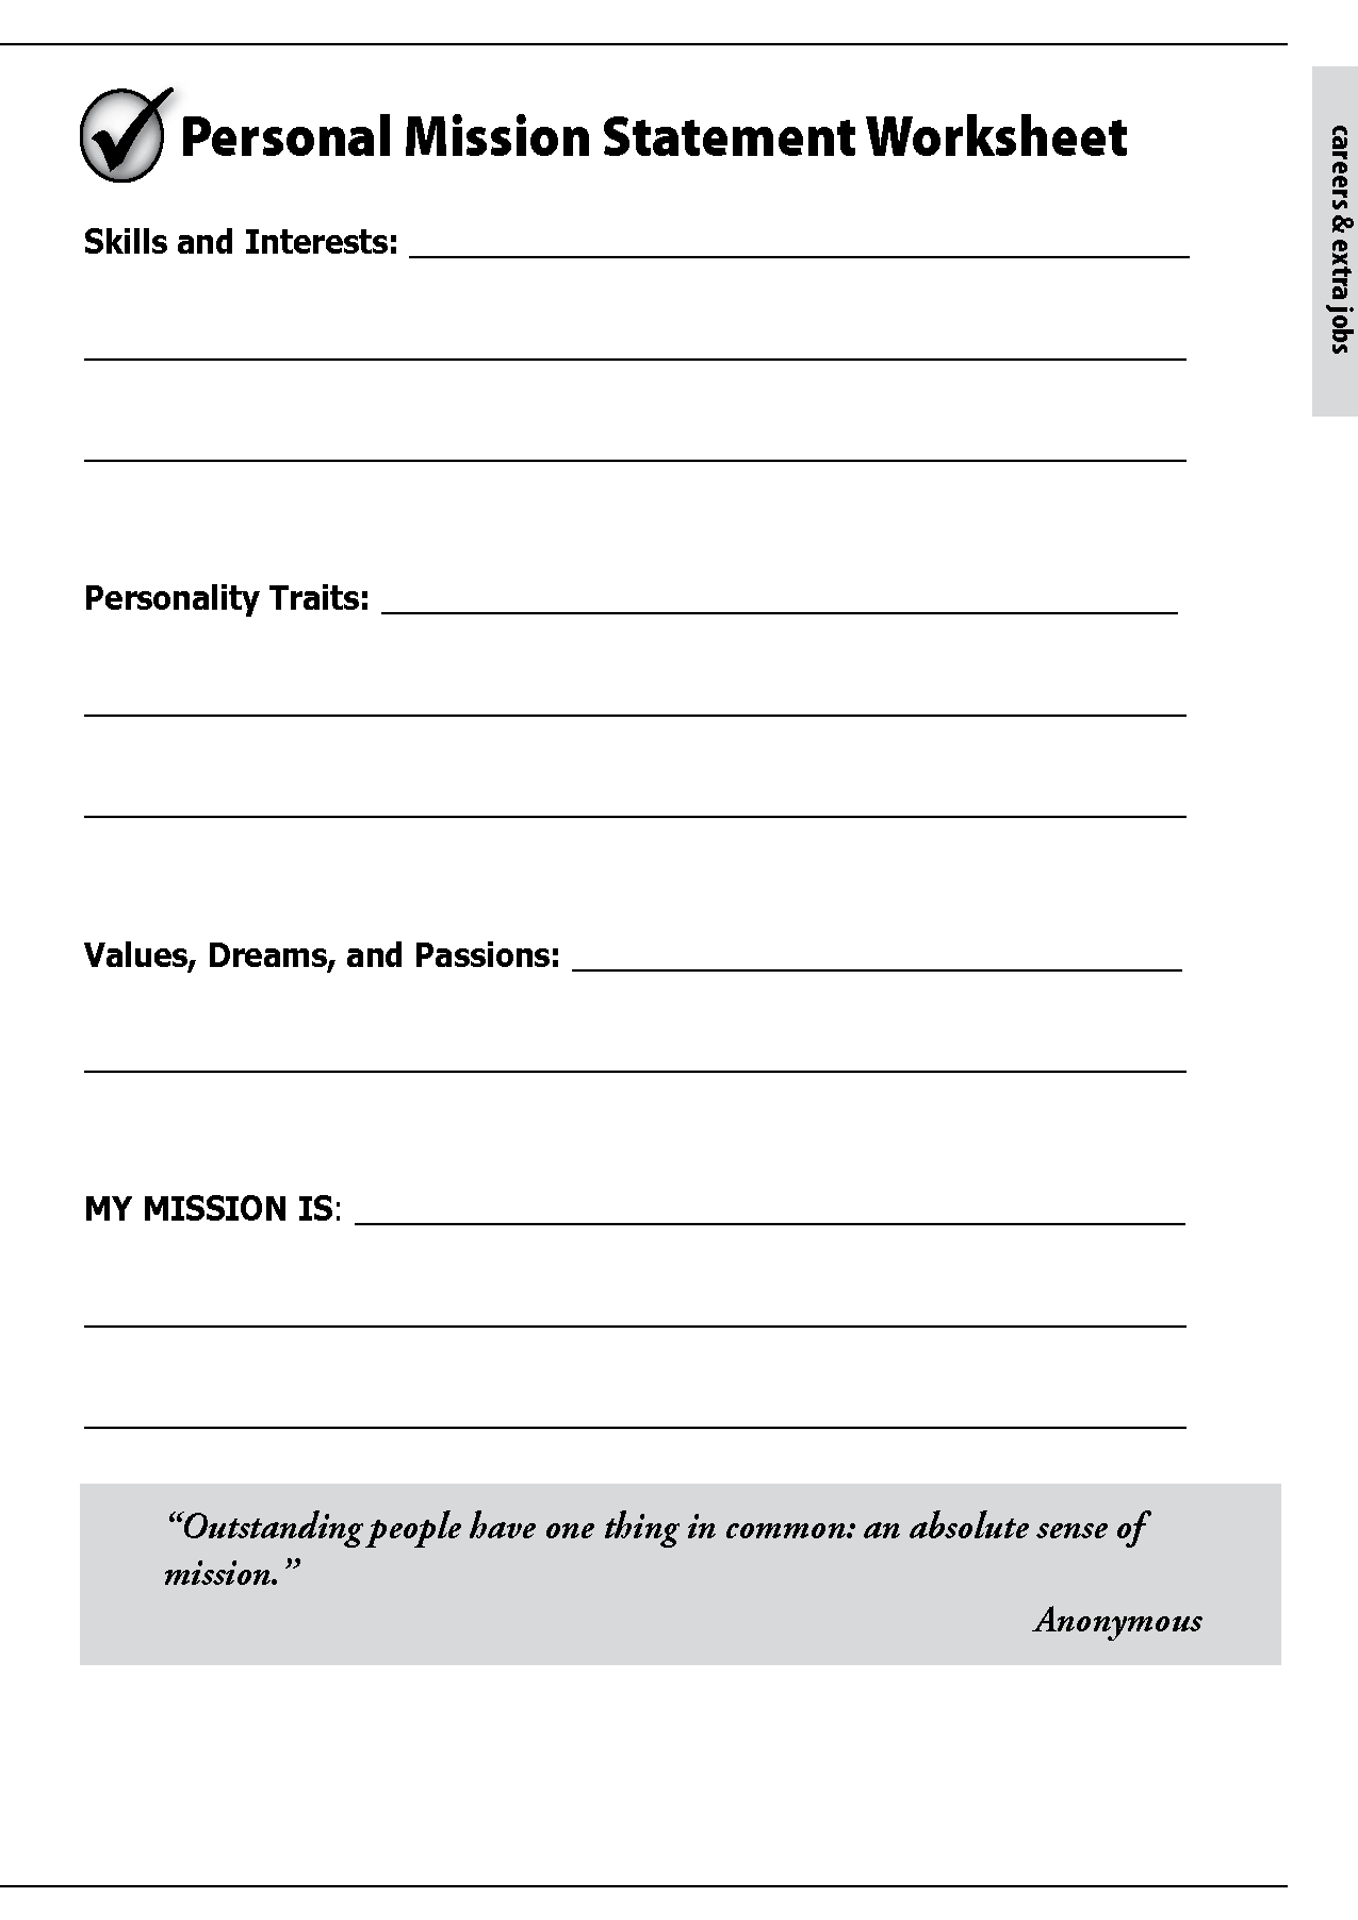 Personal Mission Statement Worksheet Free